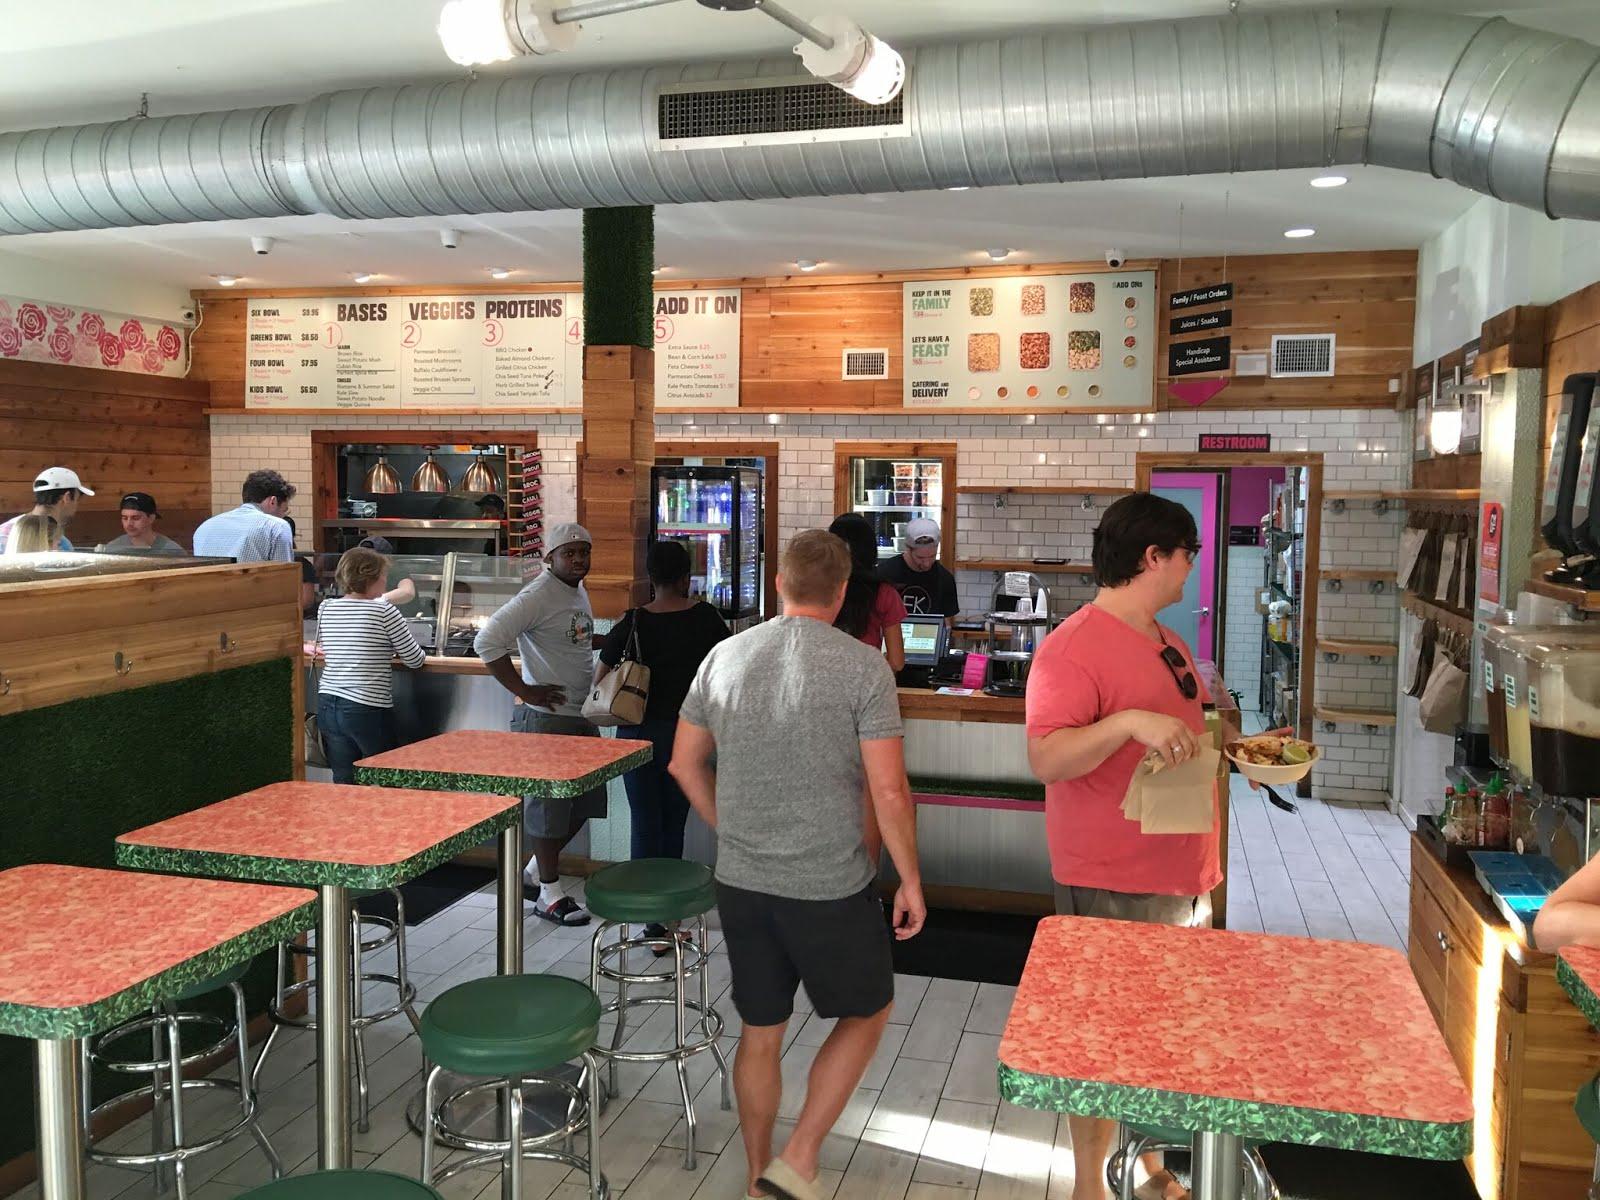 tampas fresh kitchen restaurant set to open several orlando locations